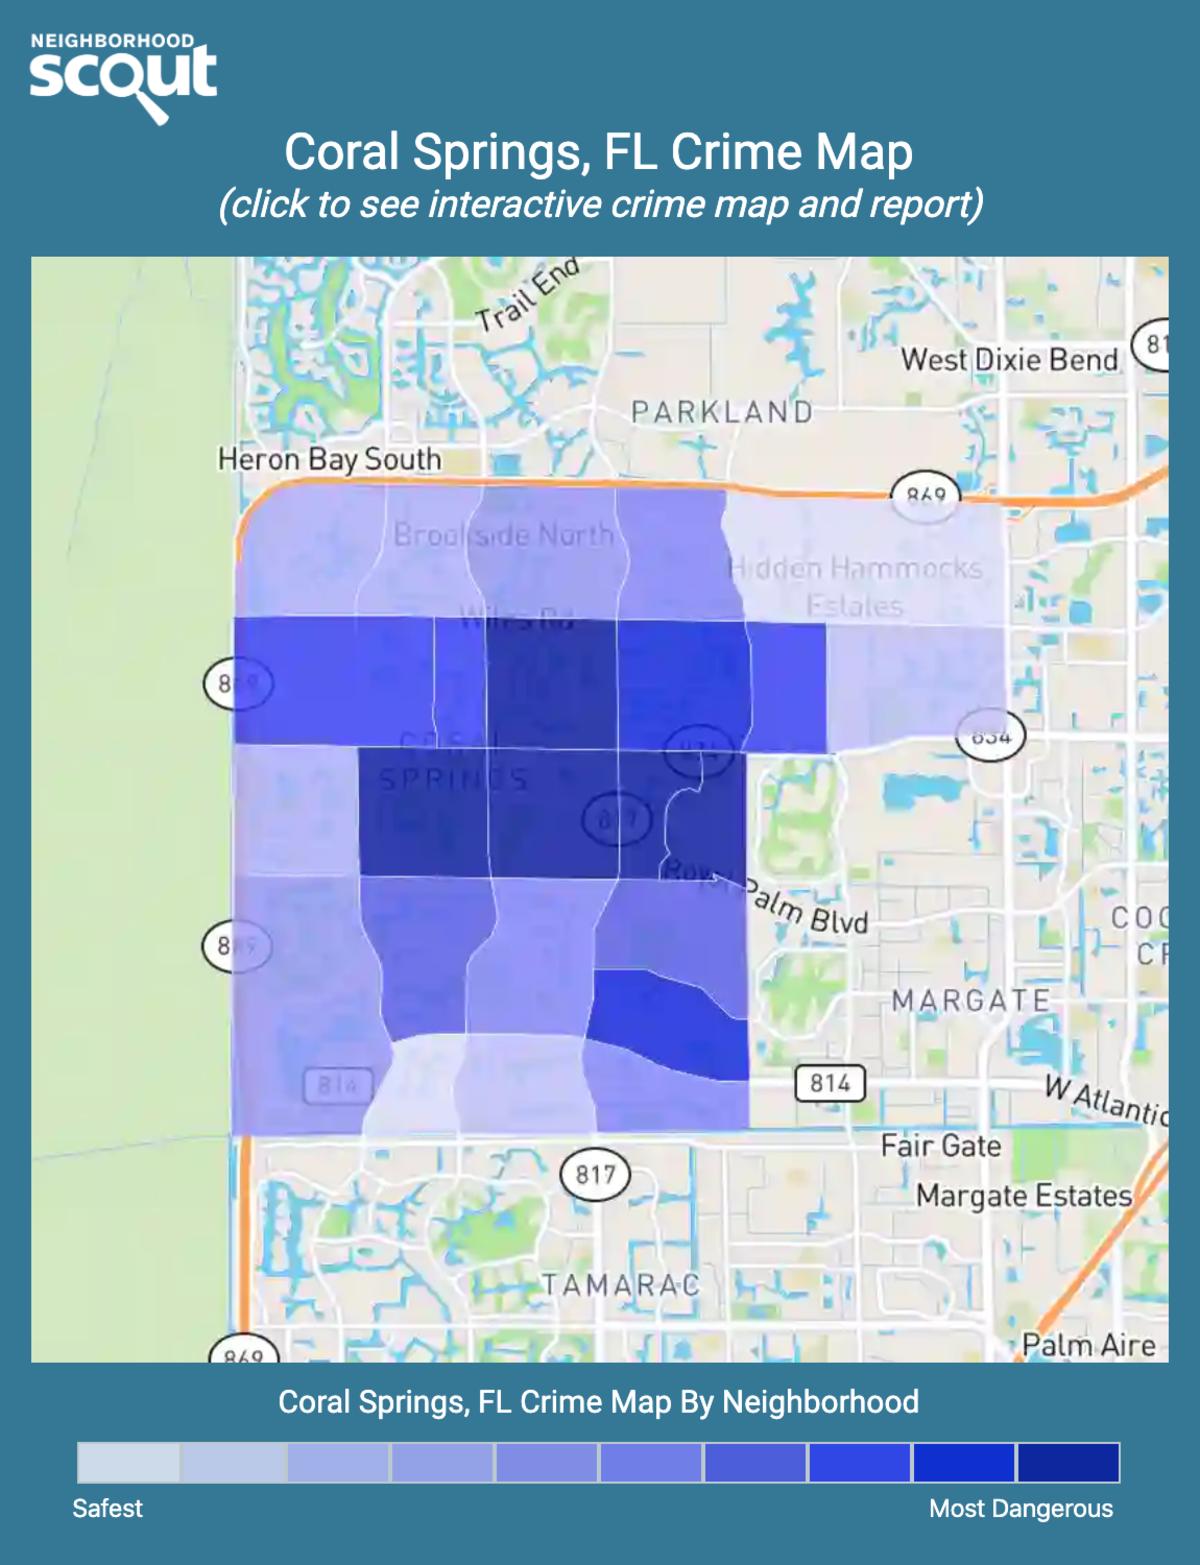 Coral Springs, Florida crime map